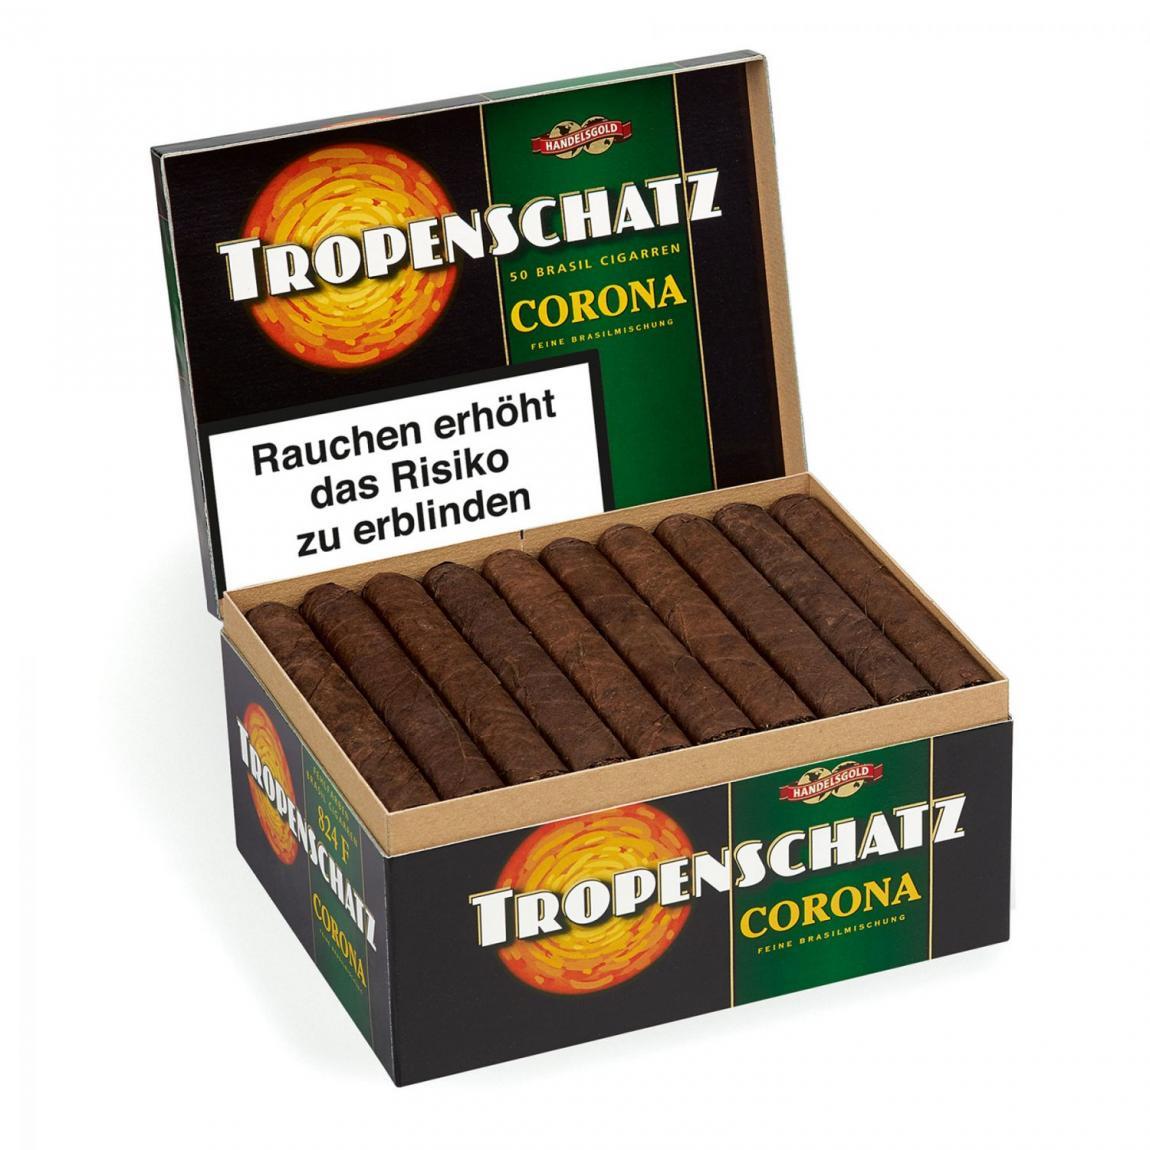 Handelsgold »Tropenschatz« Coronas Brasil 824, 50er Karton